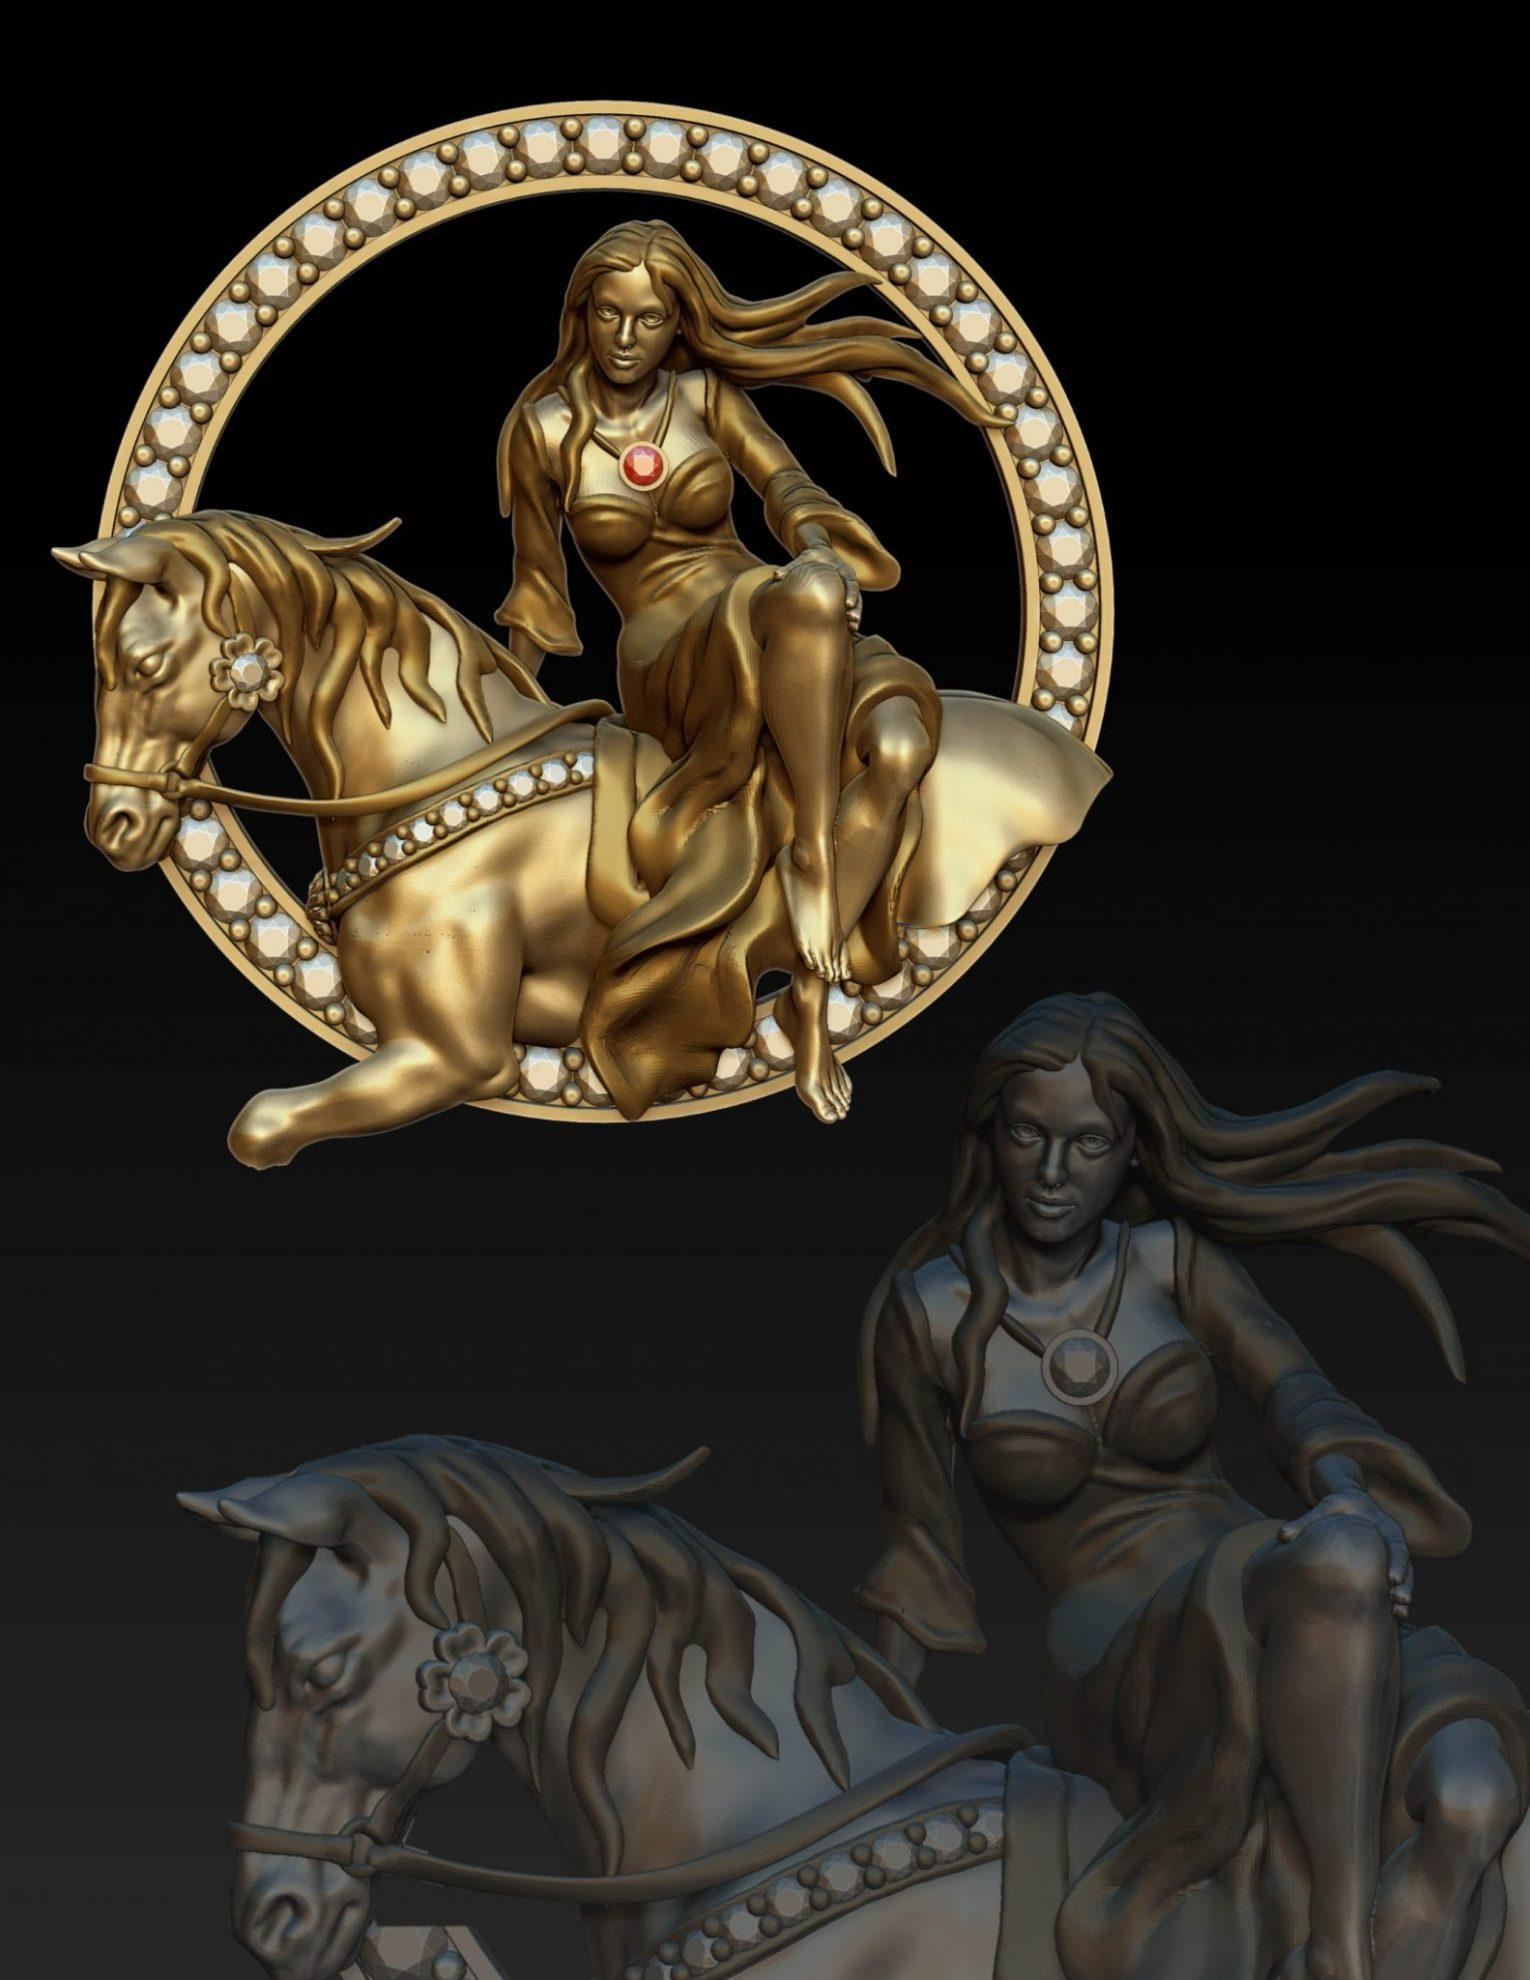 نرم افزار زیبراش,طراحی طلا و جواهر در زیبراش,طراحی جواهرات در زیبراش,دوره طراحی طلا با زیبراش,آکادمی طراحی مرتضوی